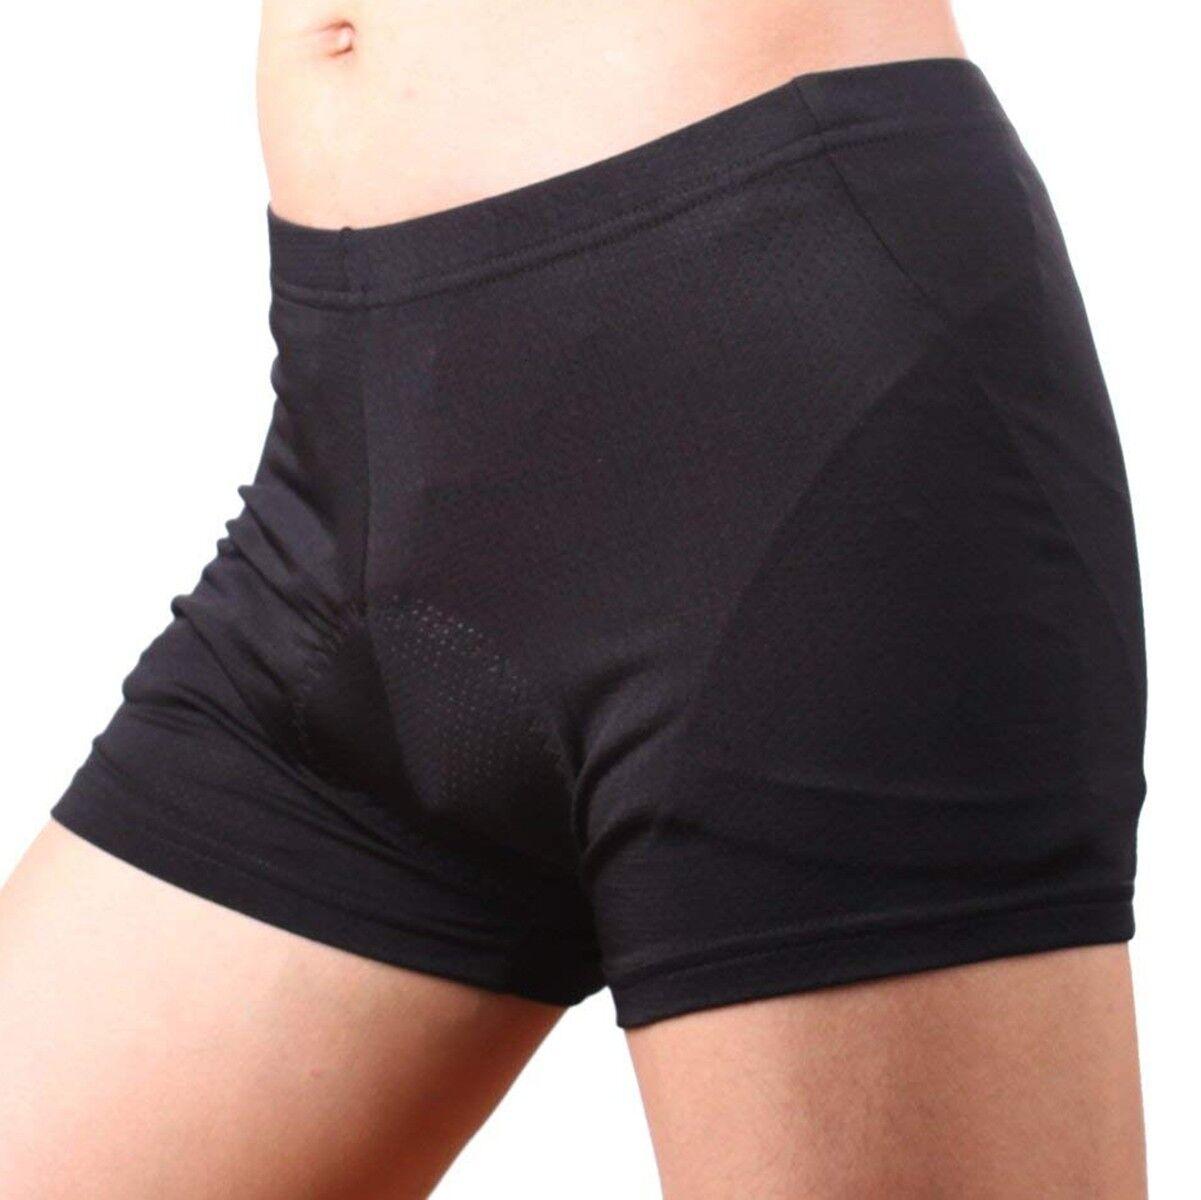 Mens Cycling Shorts Bicycle Wear Tights 4D Gel Padded Lycra Short Cycle Clothing